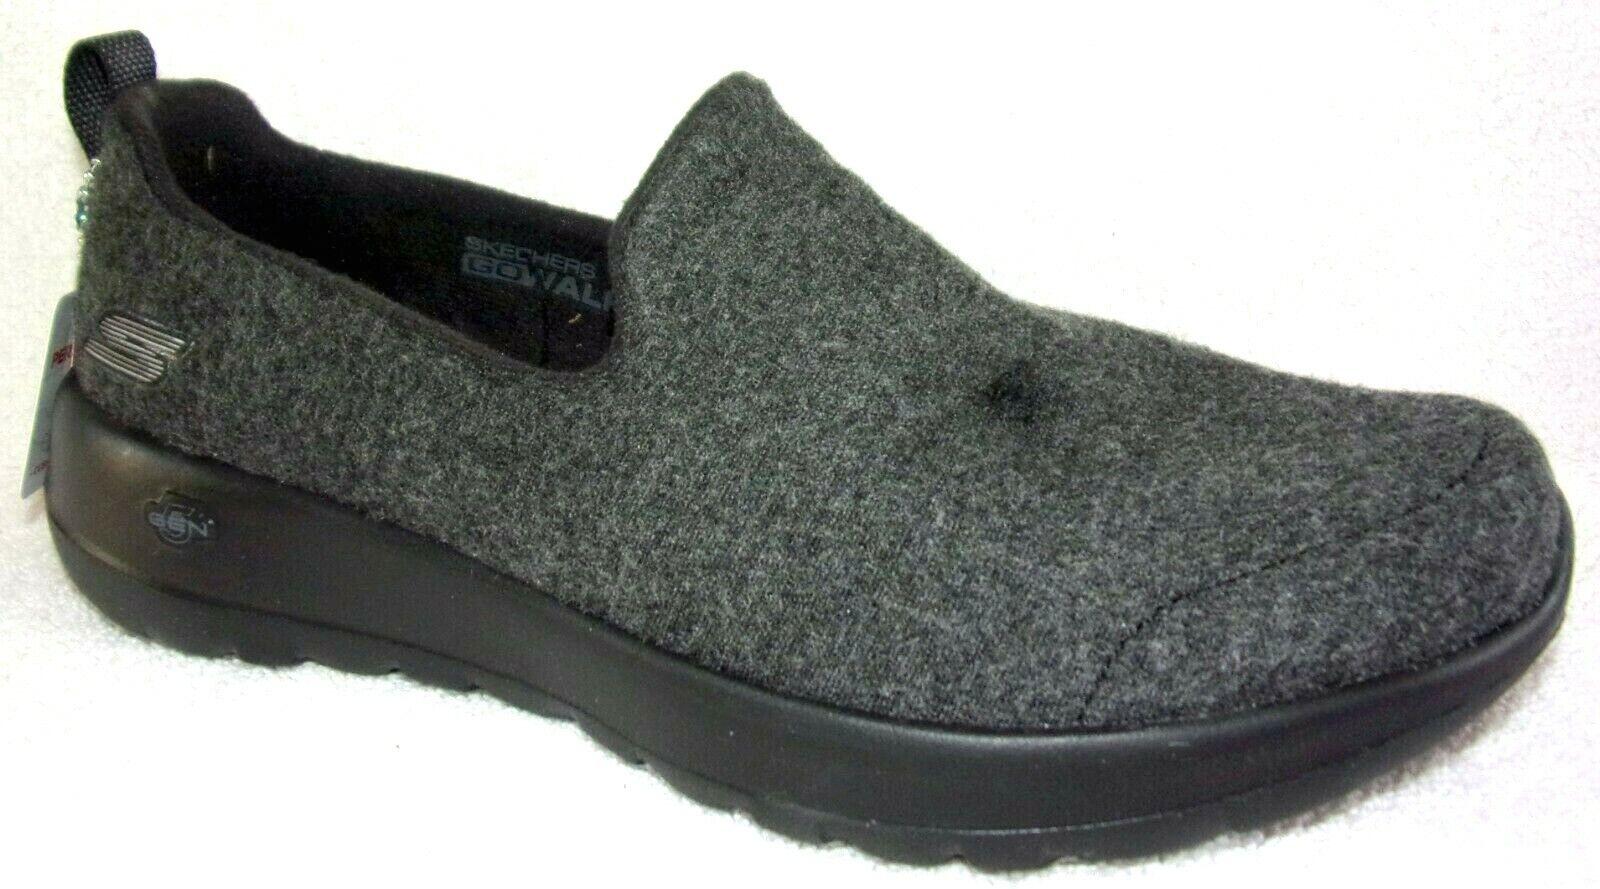 New Skechers GO Walk Joy Felt Shoes Surreal Black 6.5 M